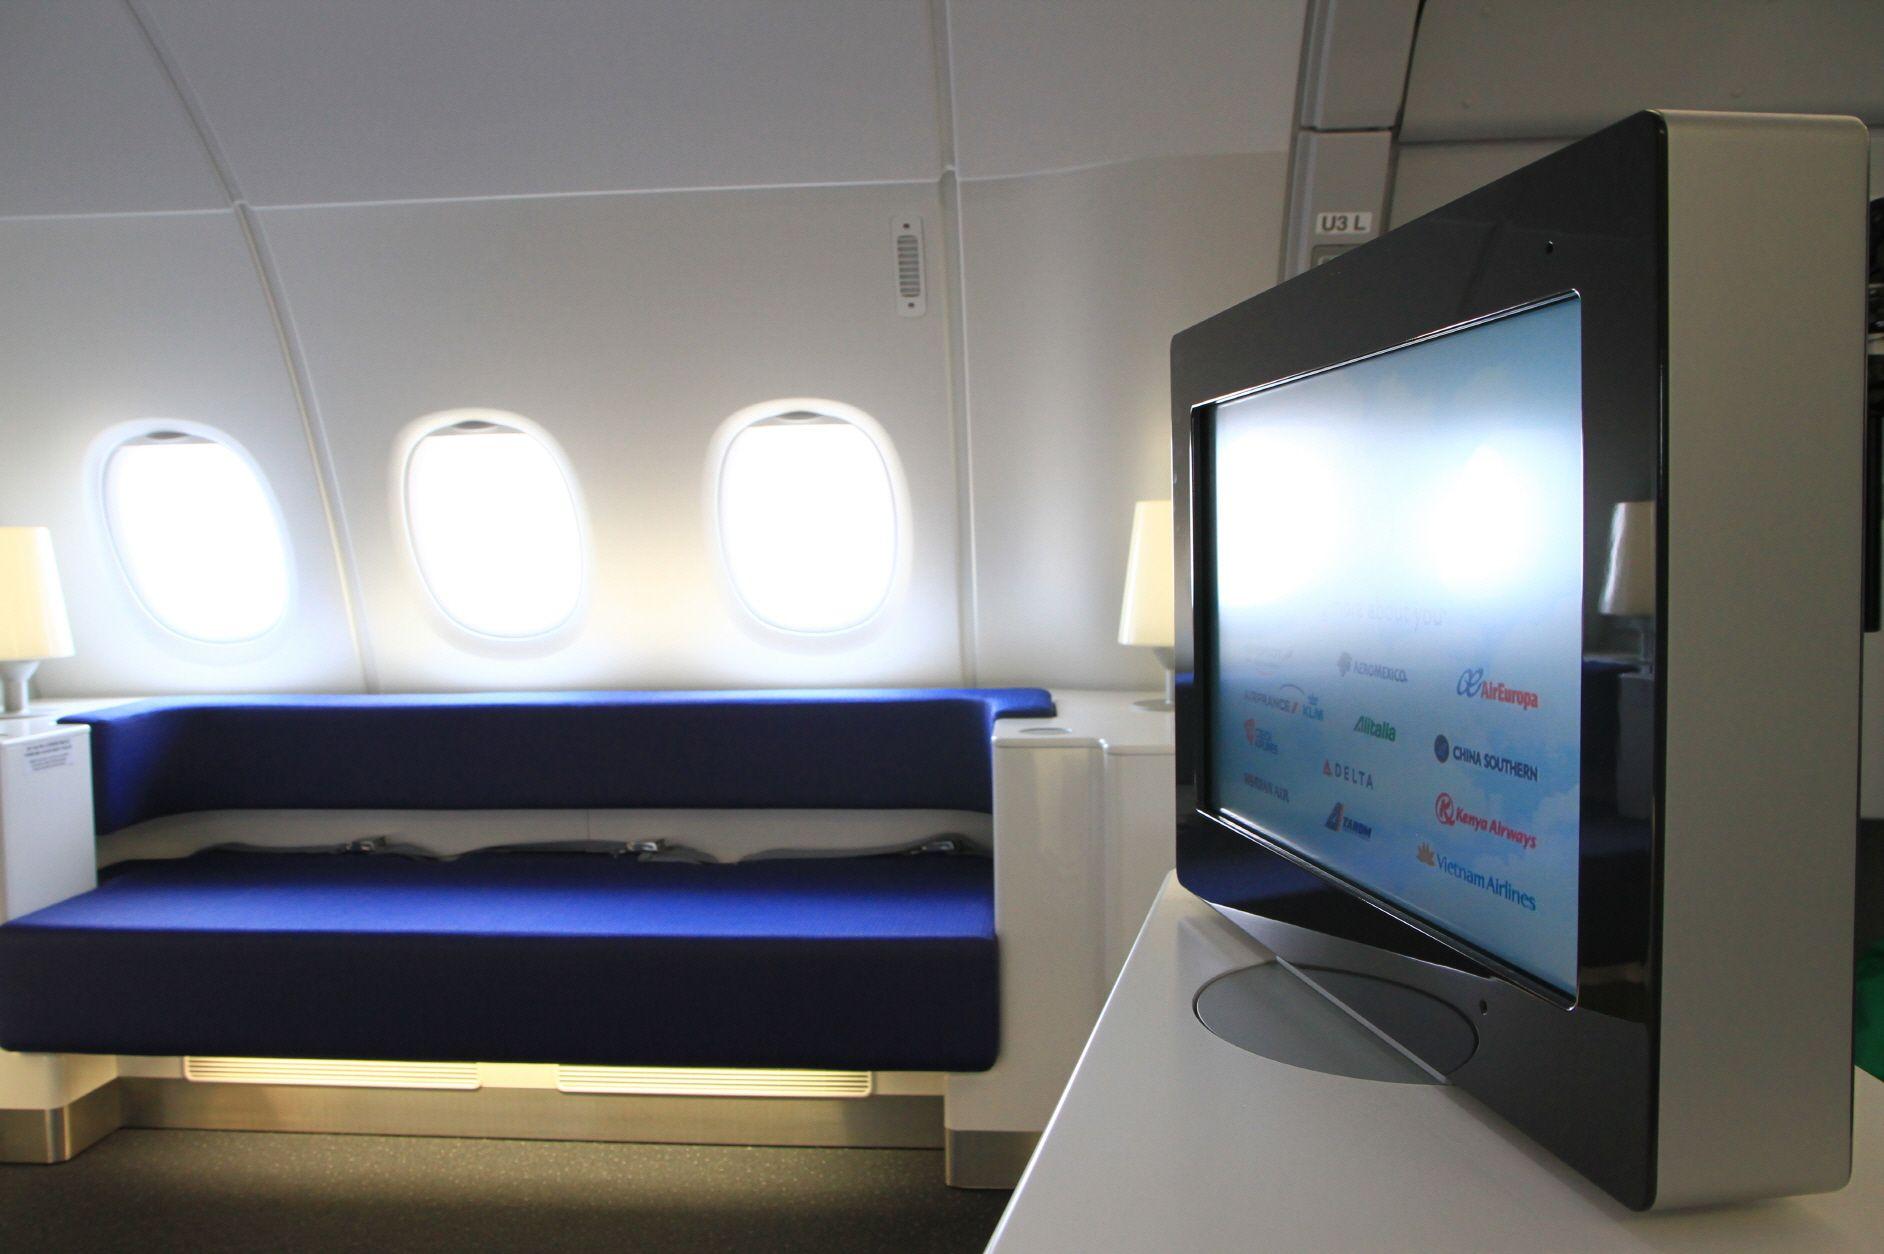 Korean Air A380 aft lounge Aircraft interiors, Korean